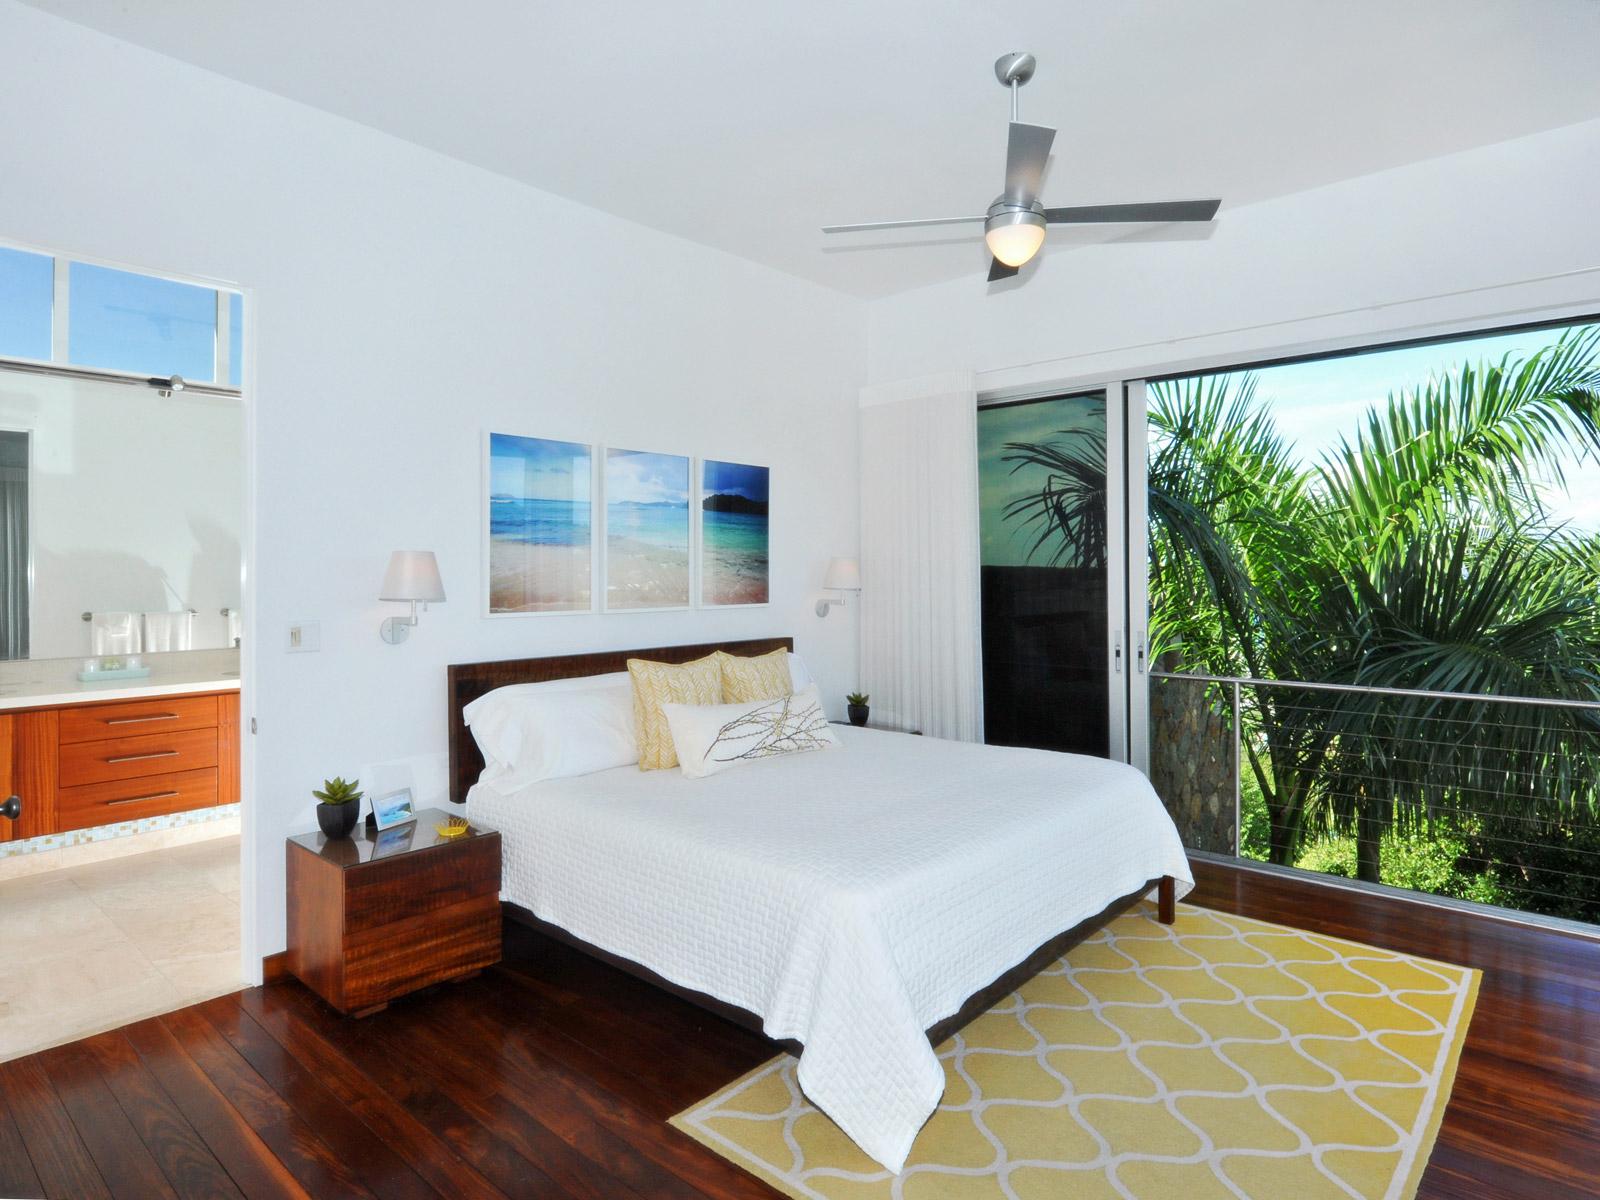 st-john-kalorama-villa-bedroom-view.jpg